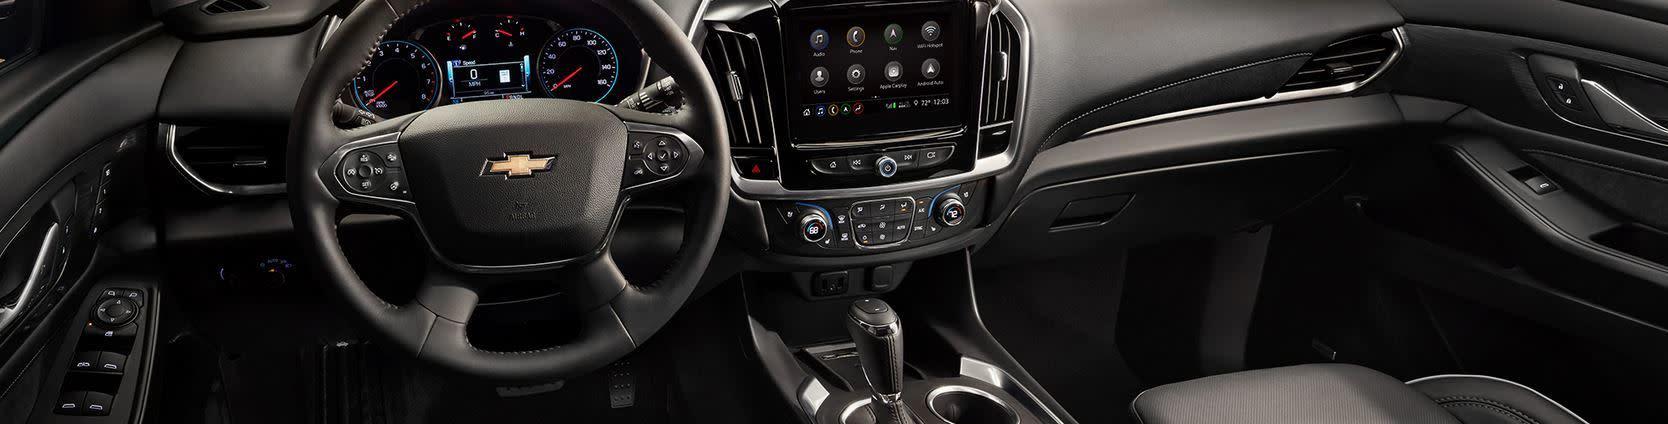 Interior of the 2020 Chevrolet Traverse